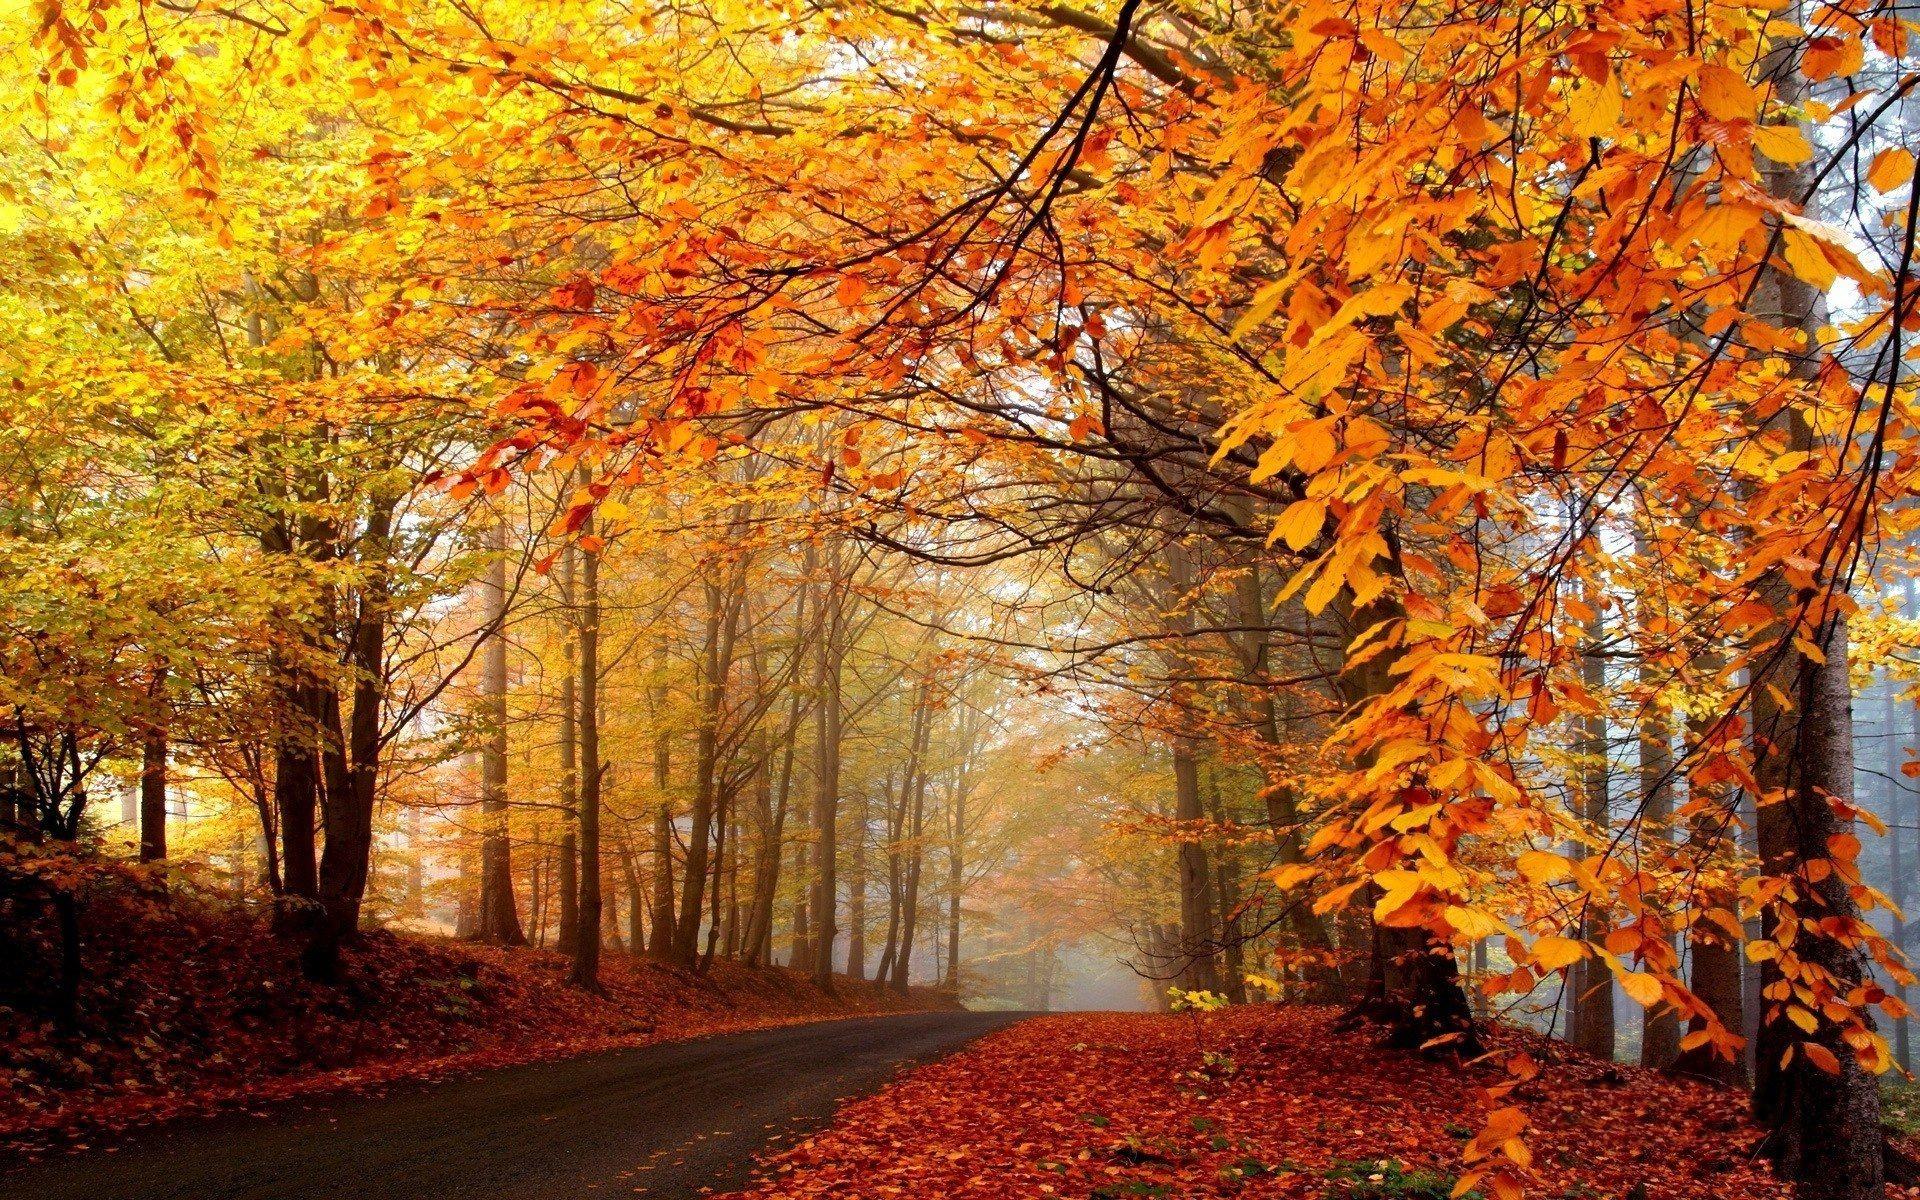 autumn scenes wallpaper ·①